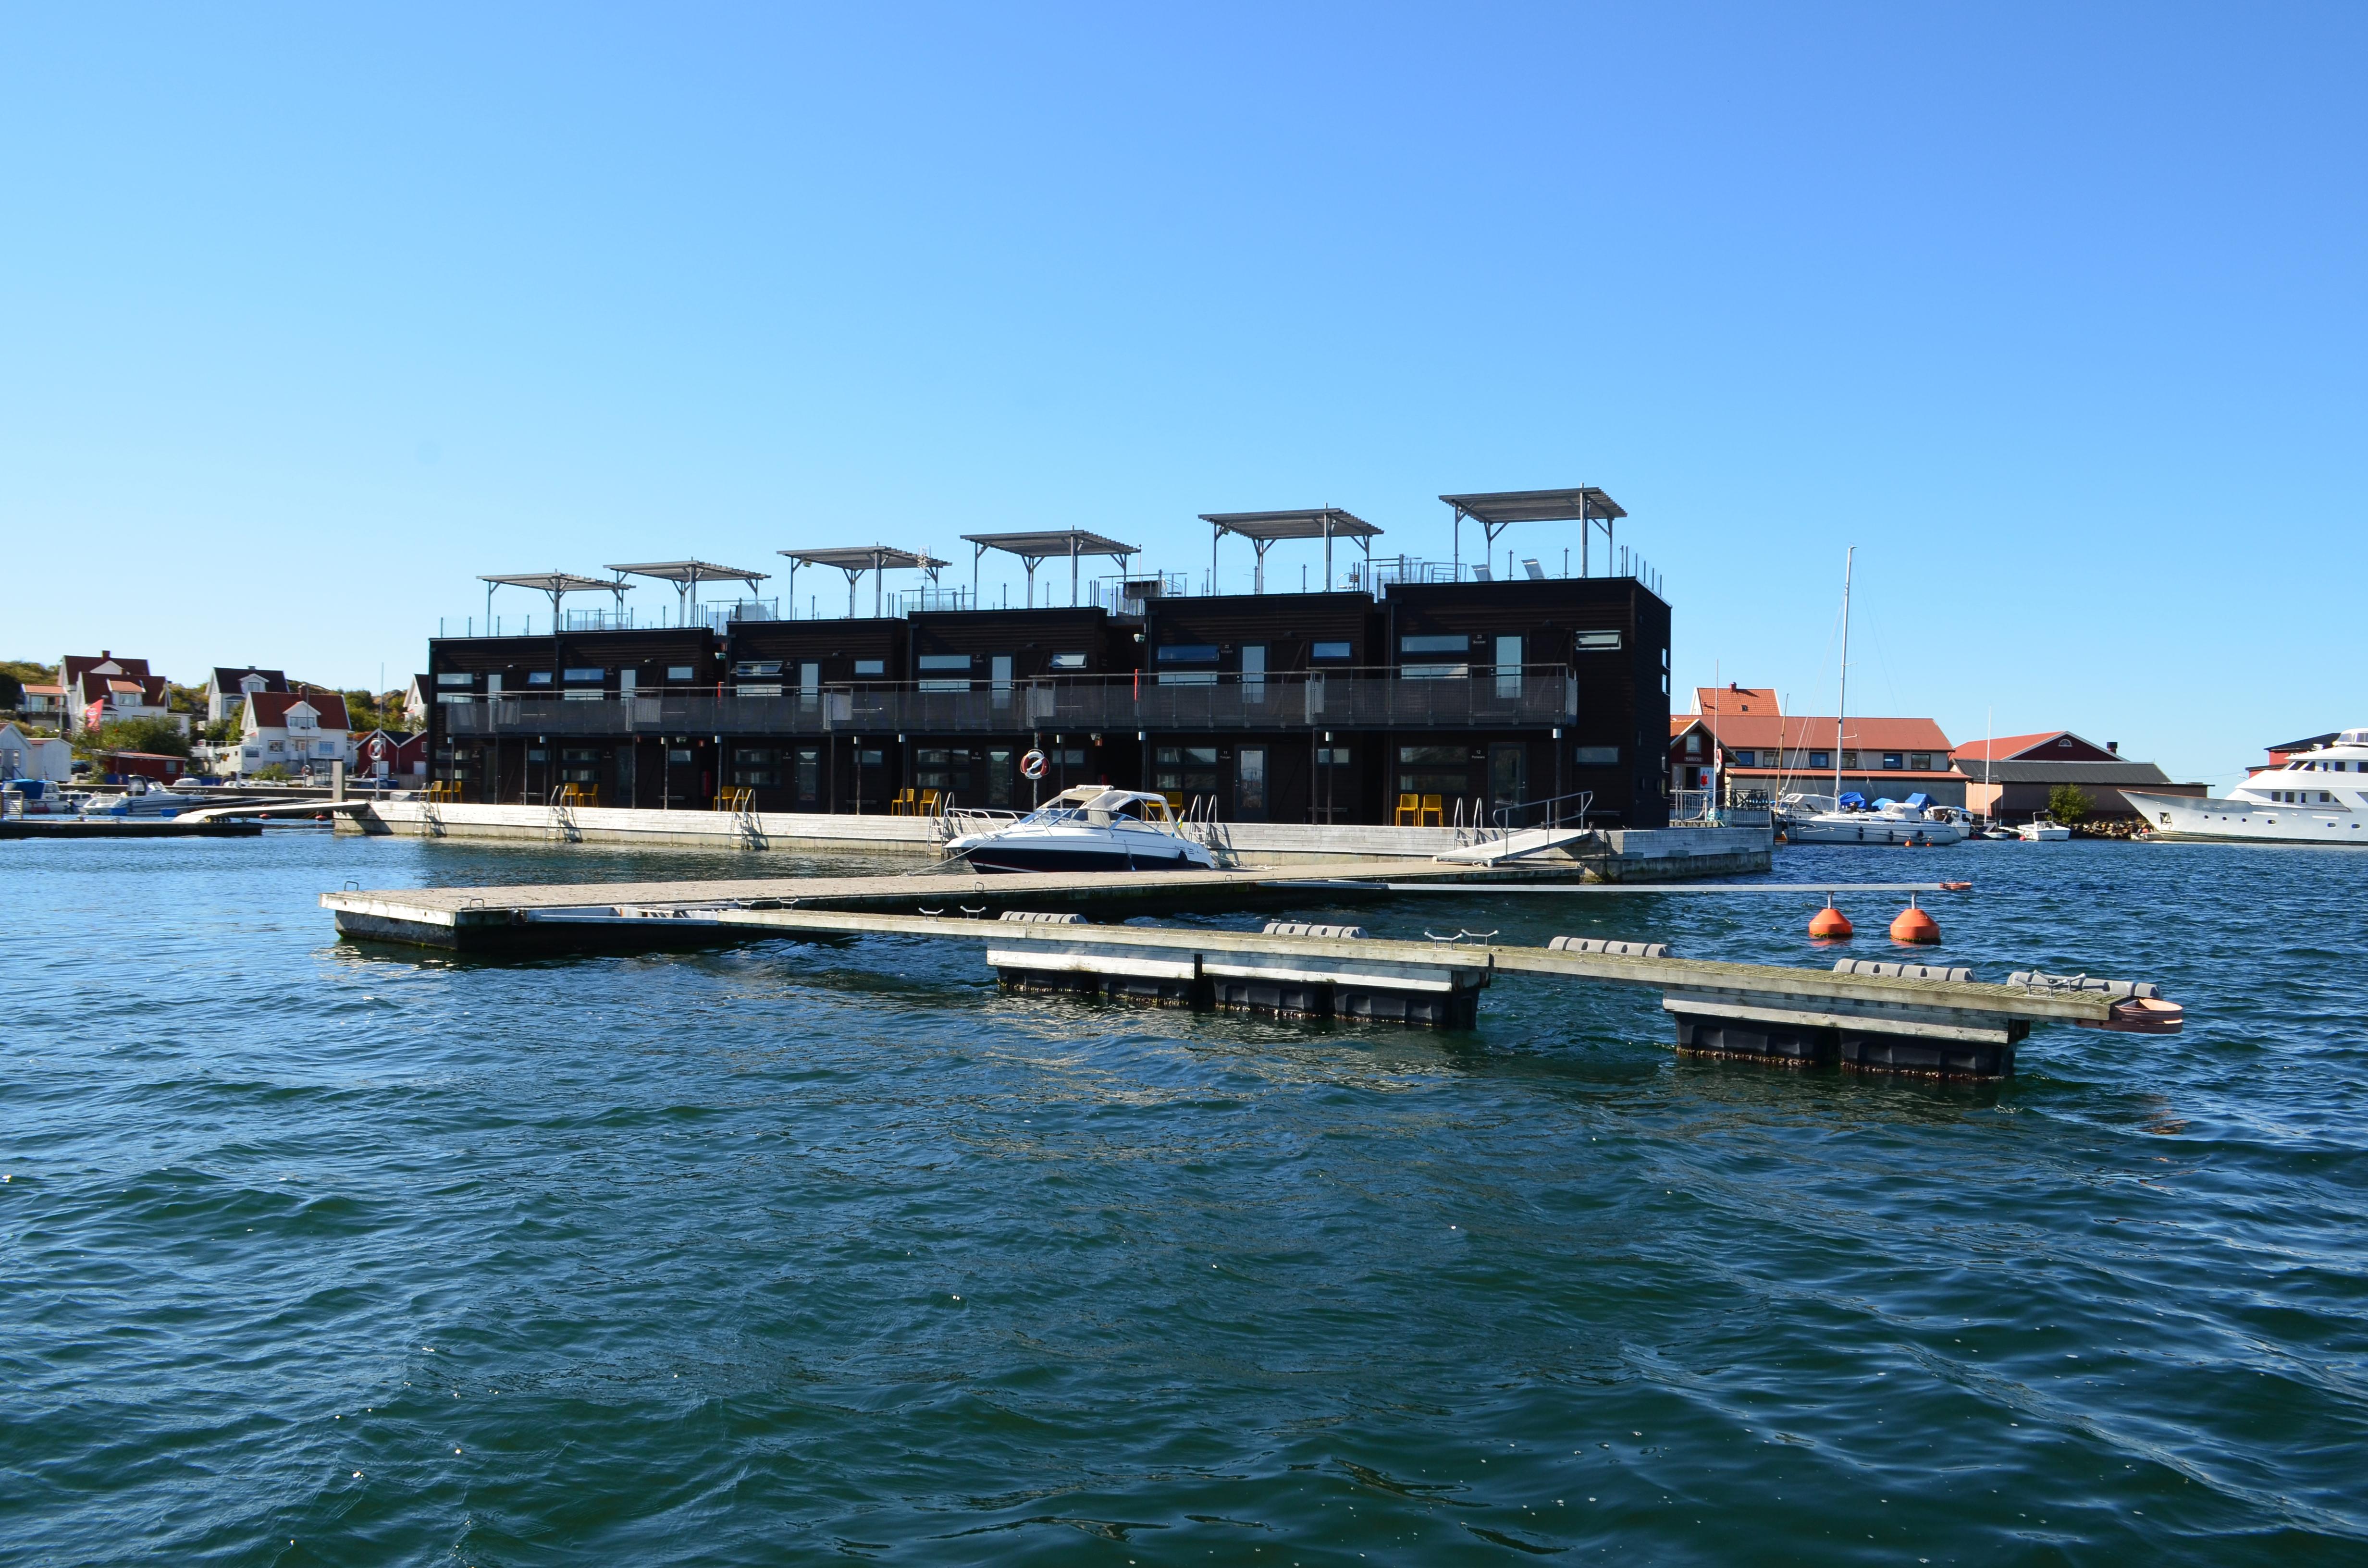 salt-and-sill-floating-hotel-sweden